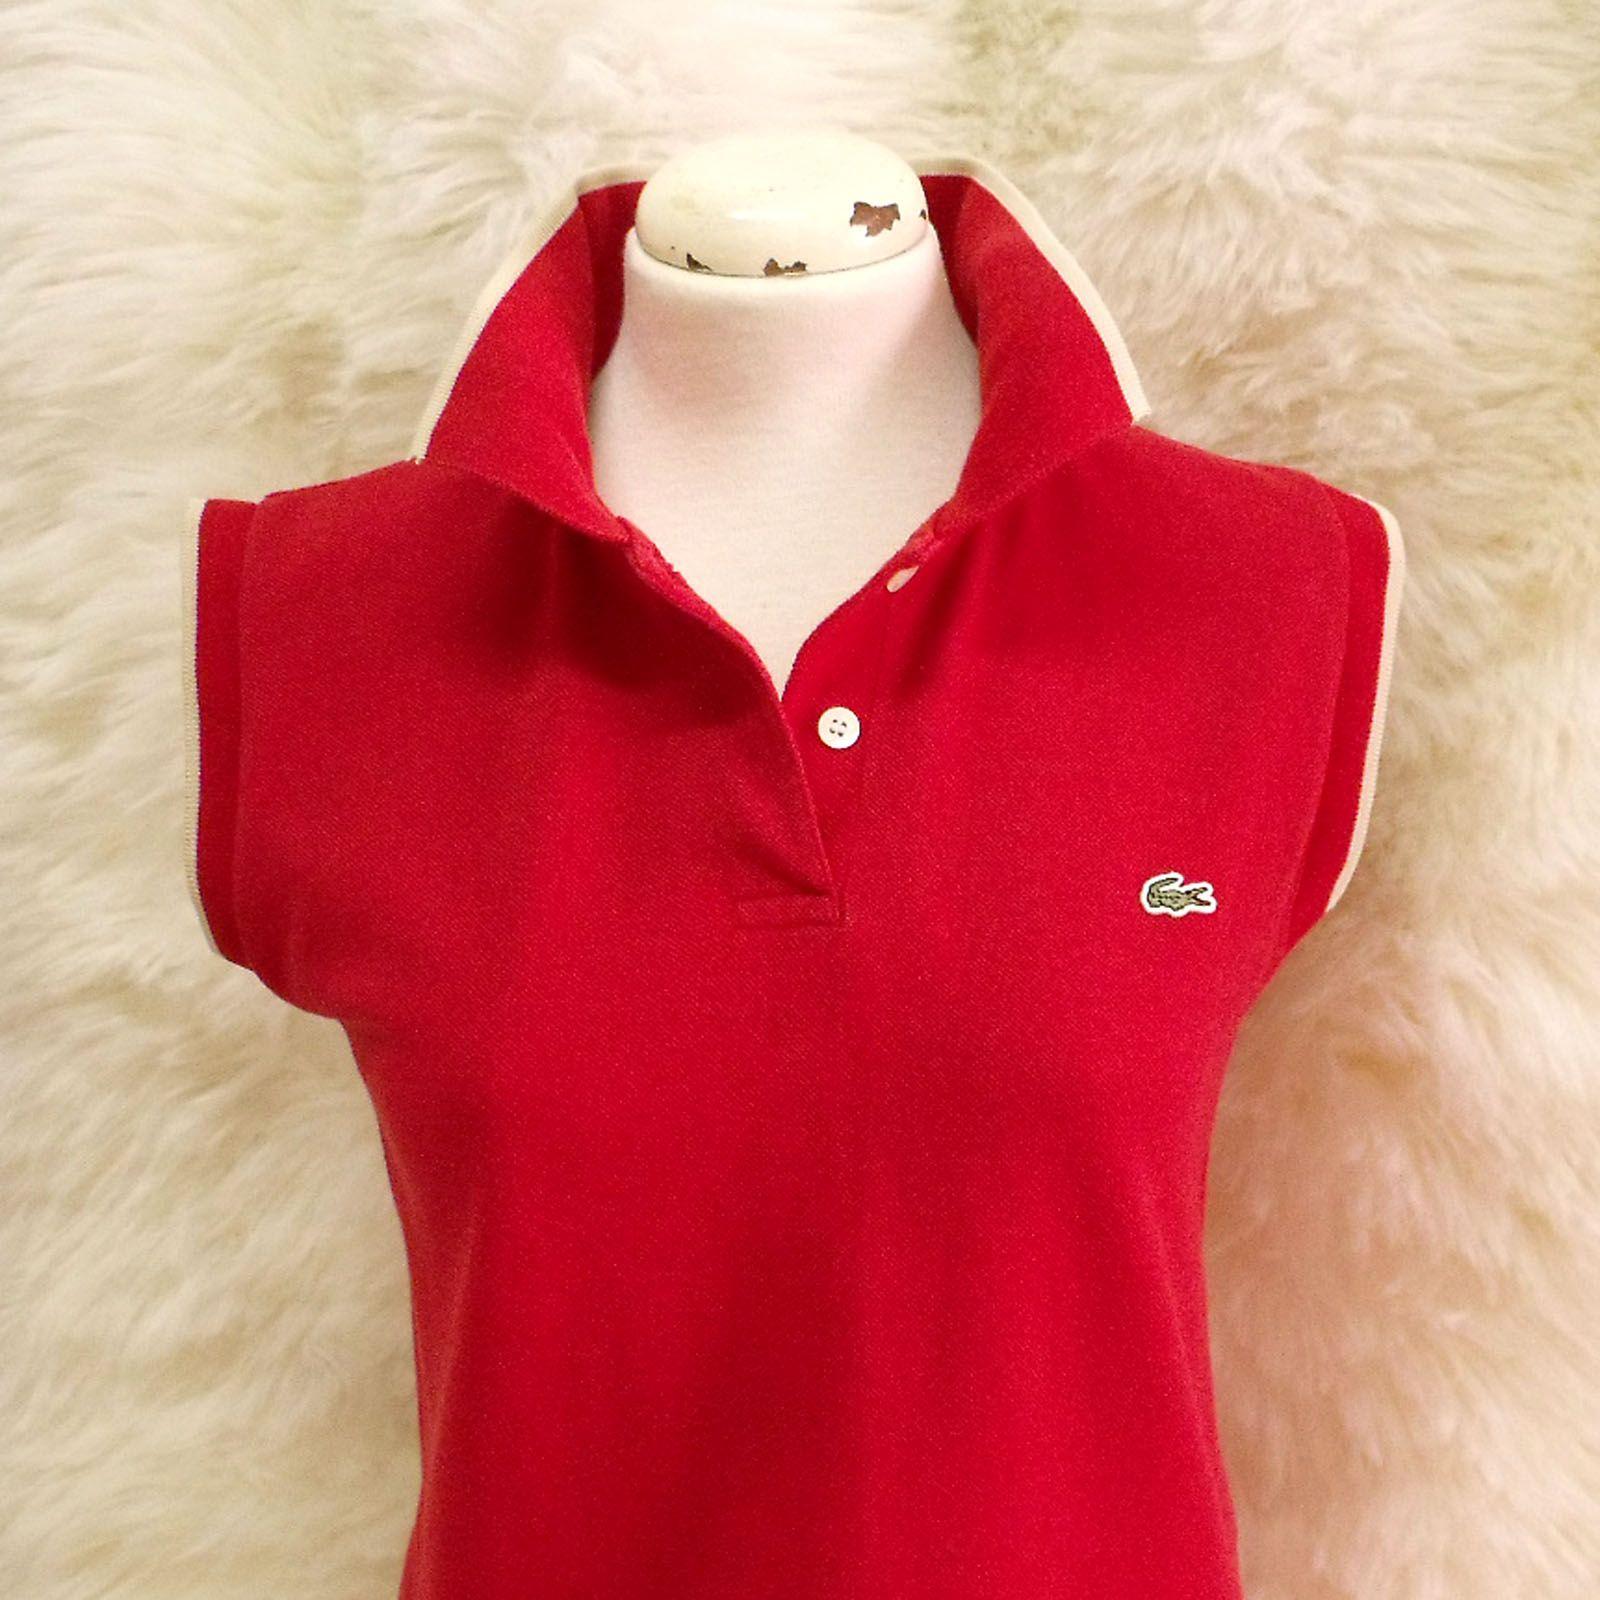 089779730 Retro LACOSTE authentic ladies polo shirt France